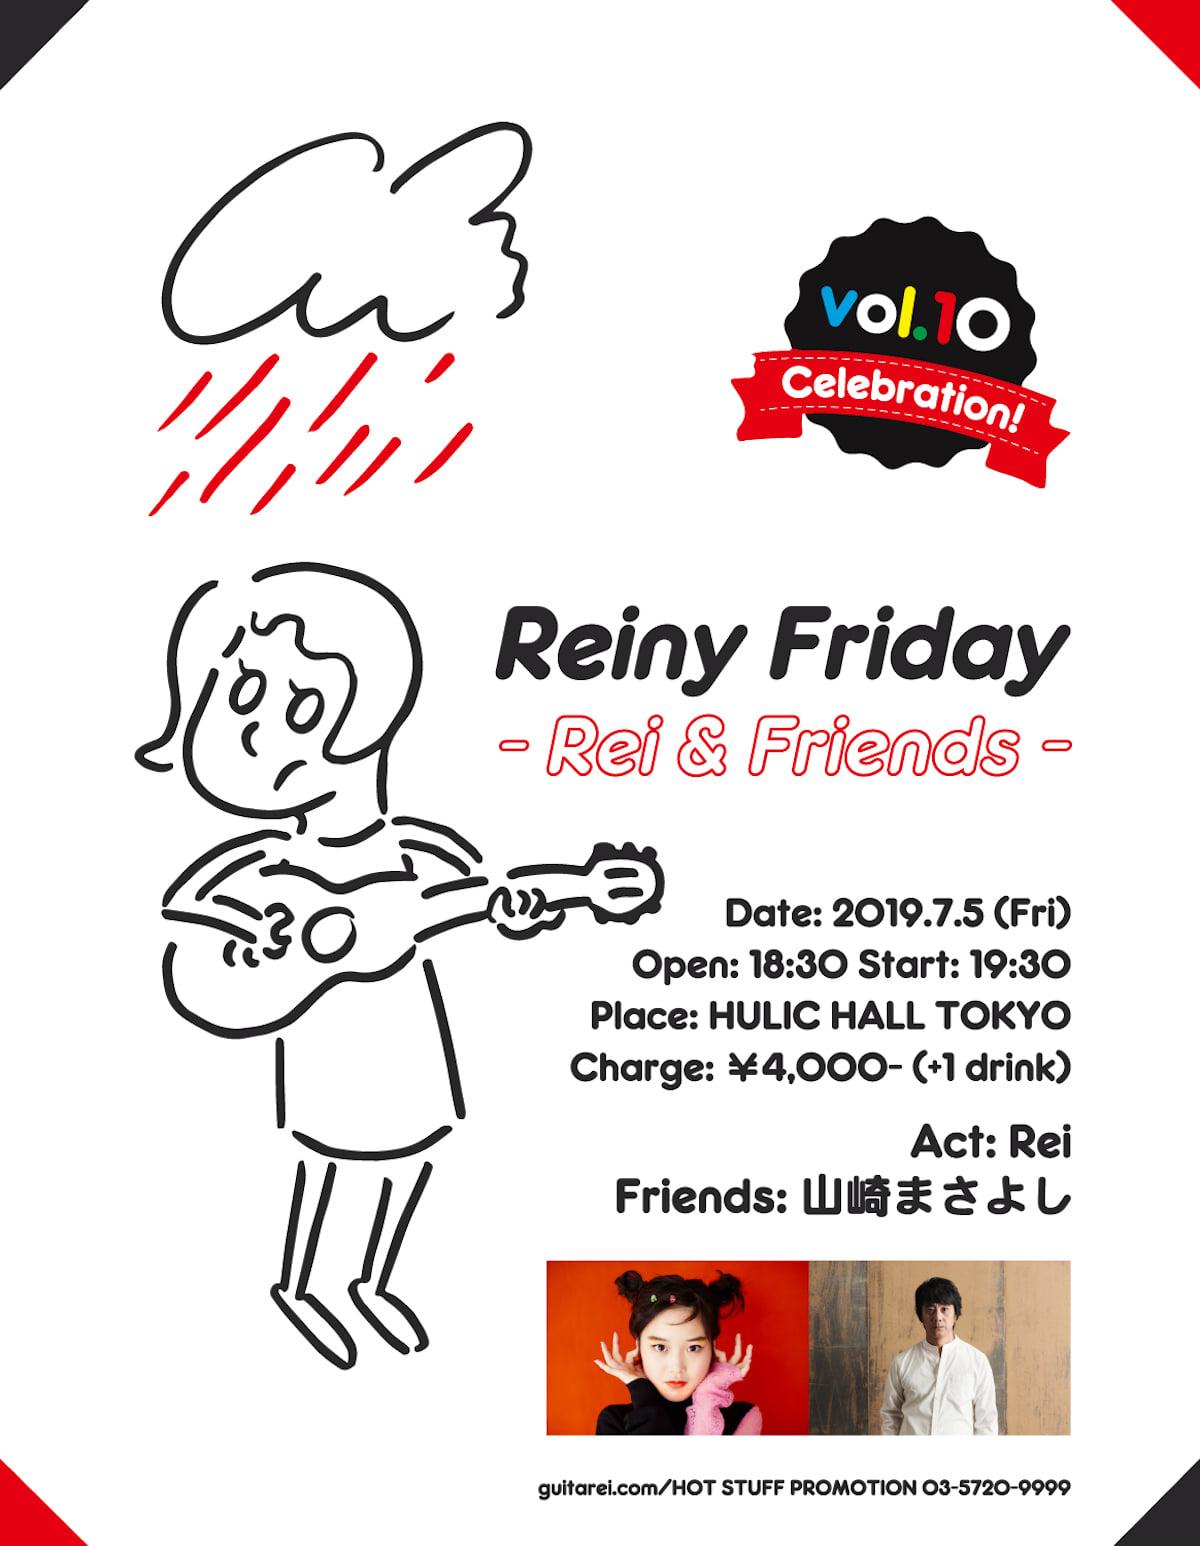 Rei、自主企画イベント<Reiny Friday -Rei & Friends- Vol.10>に山崎まさよしの出演が決定! music190315_rei_1-1200x1546